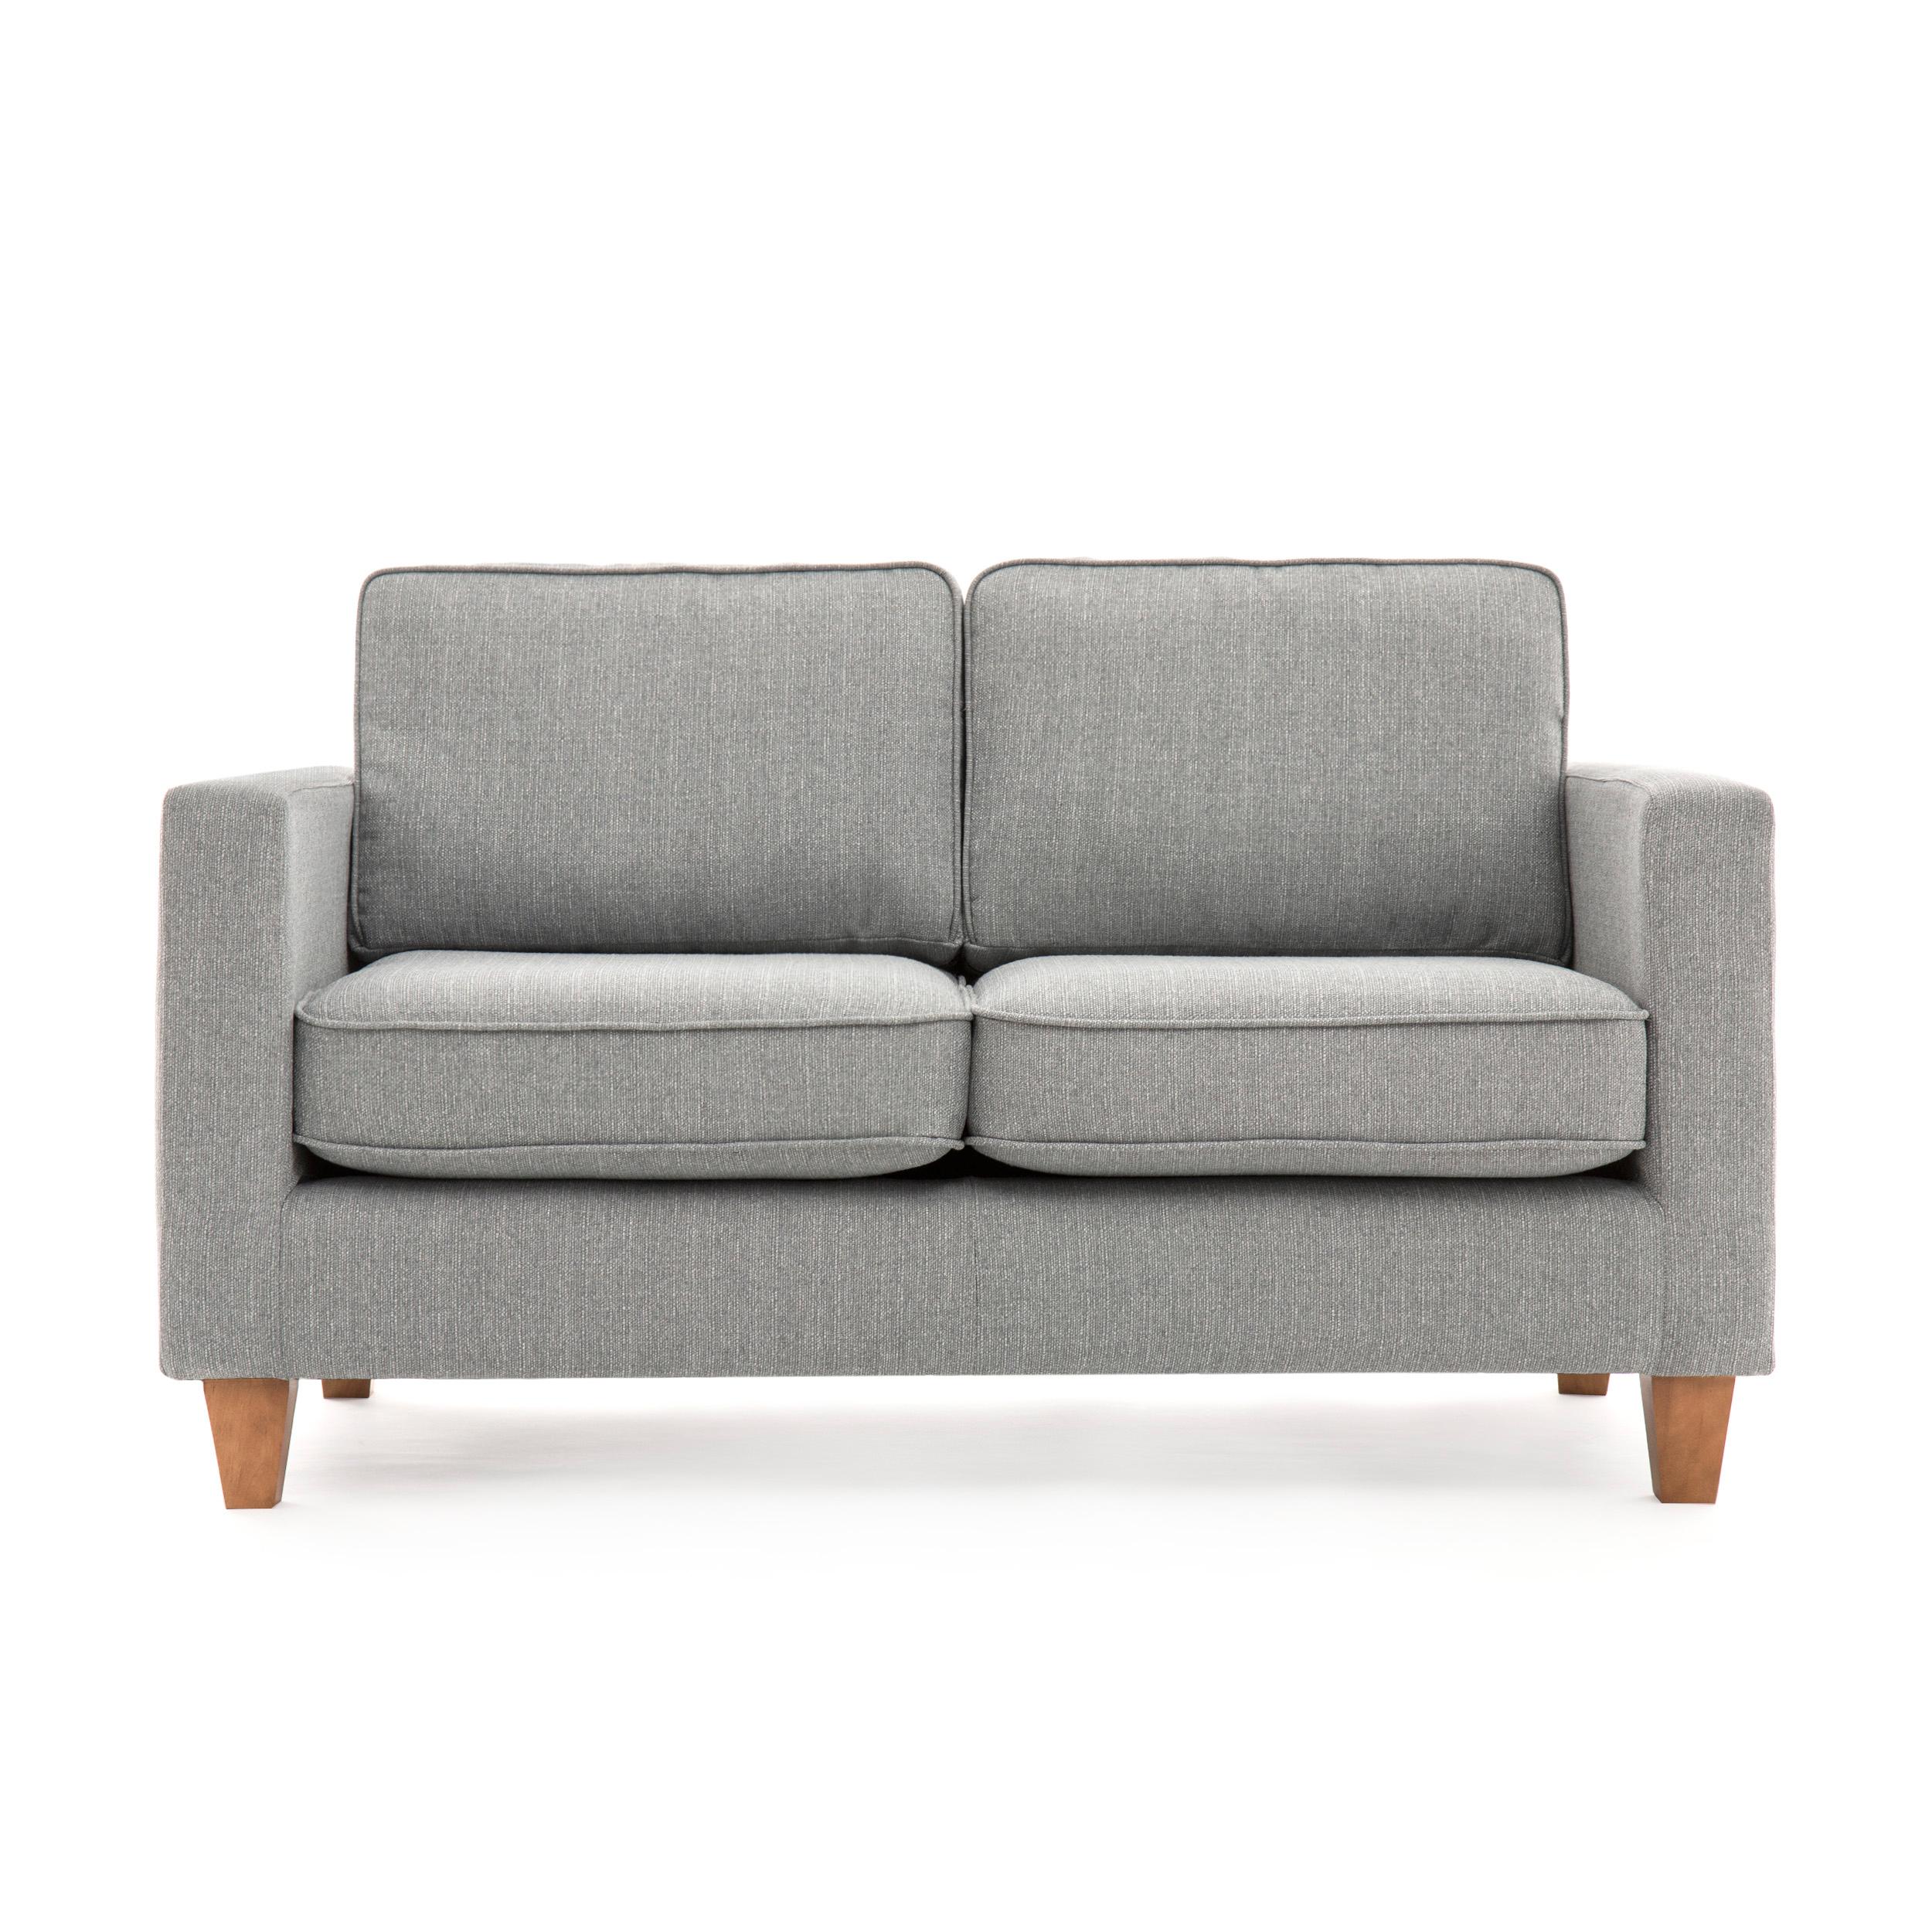 Canapea Fixa 2 locuri Sorio Light Grey